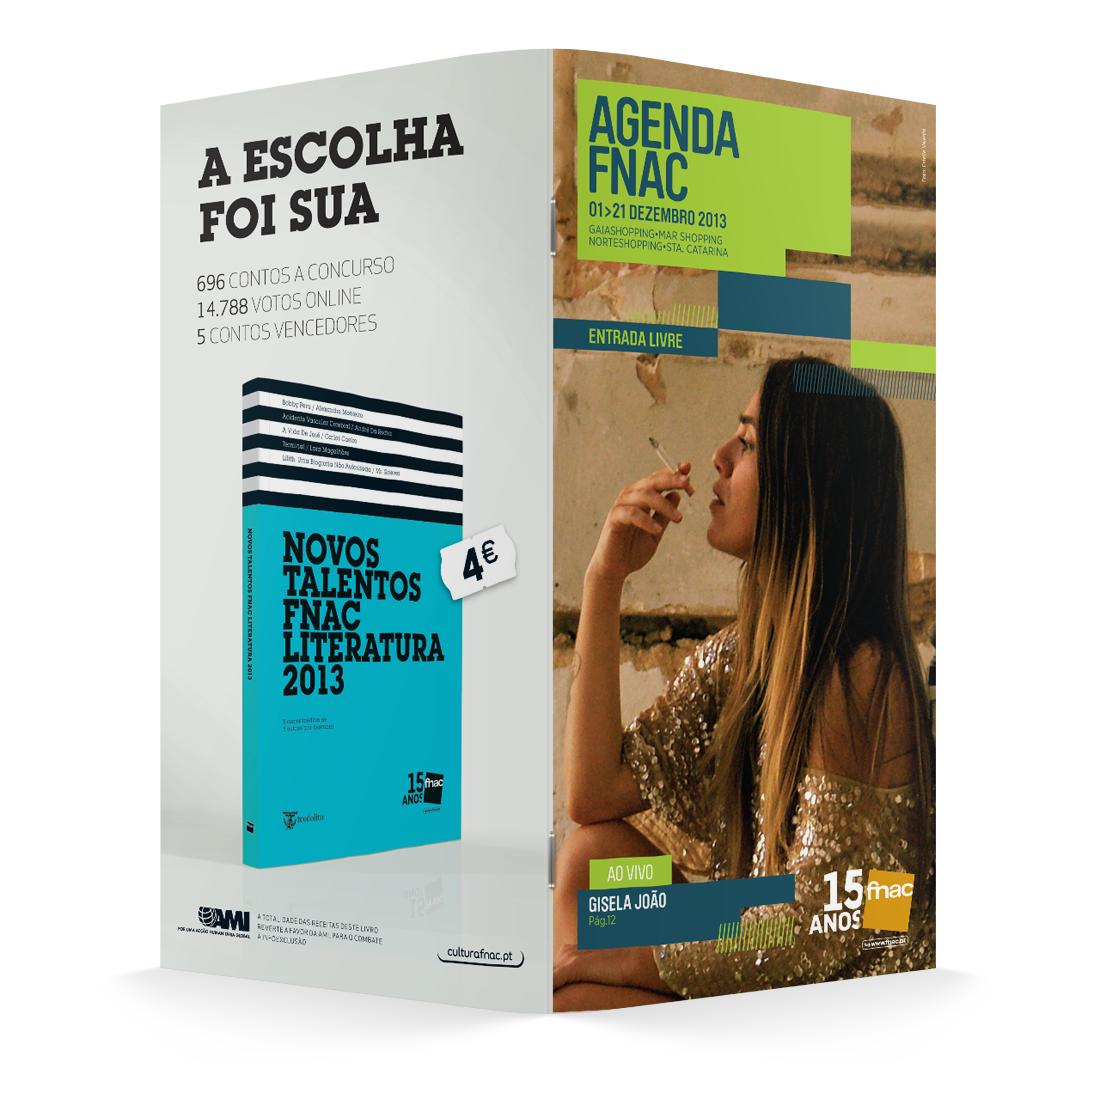 Agenda Cultural FNAC